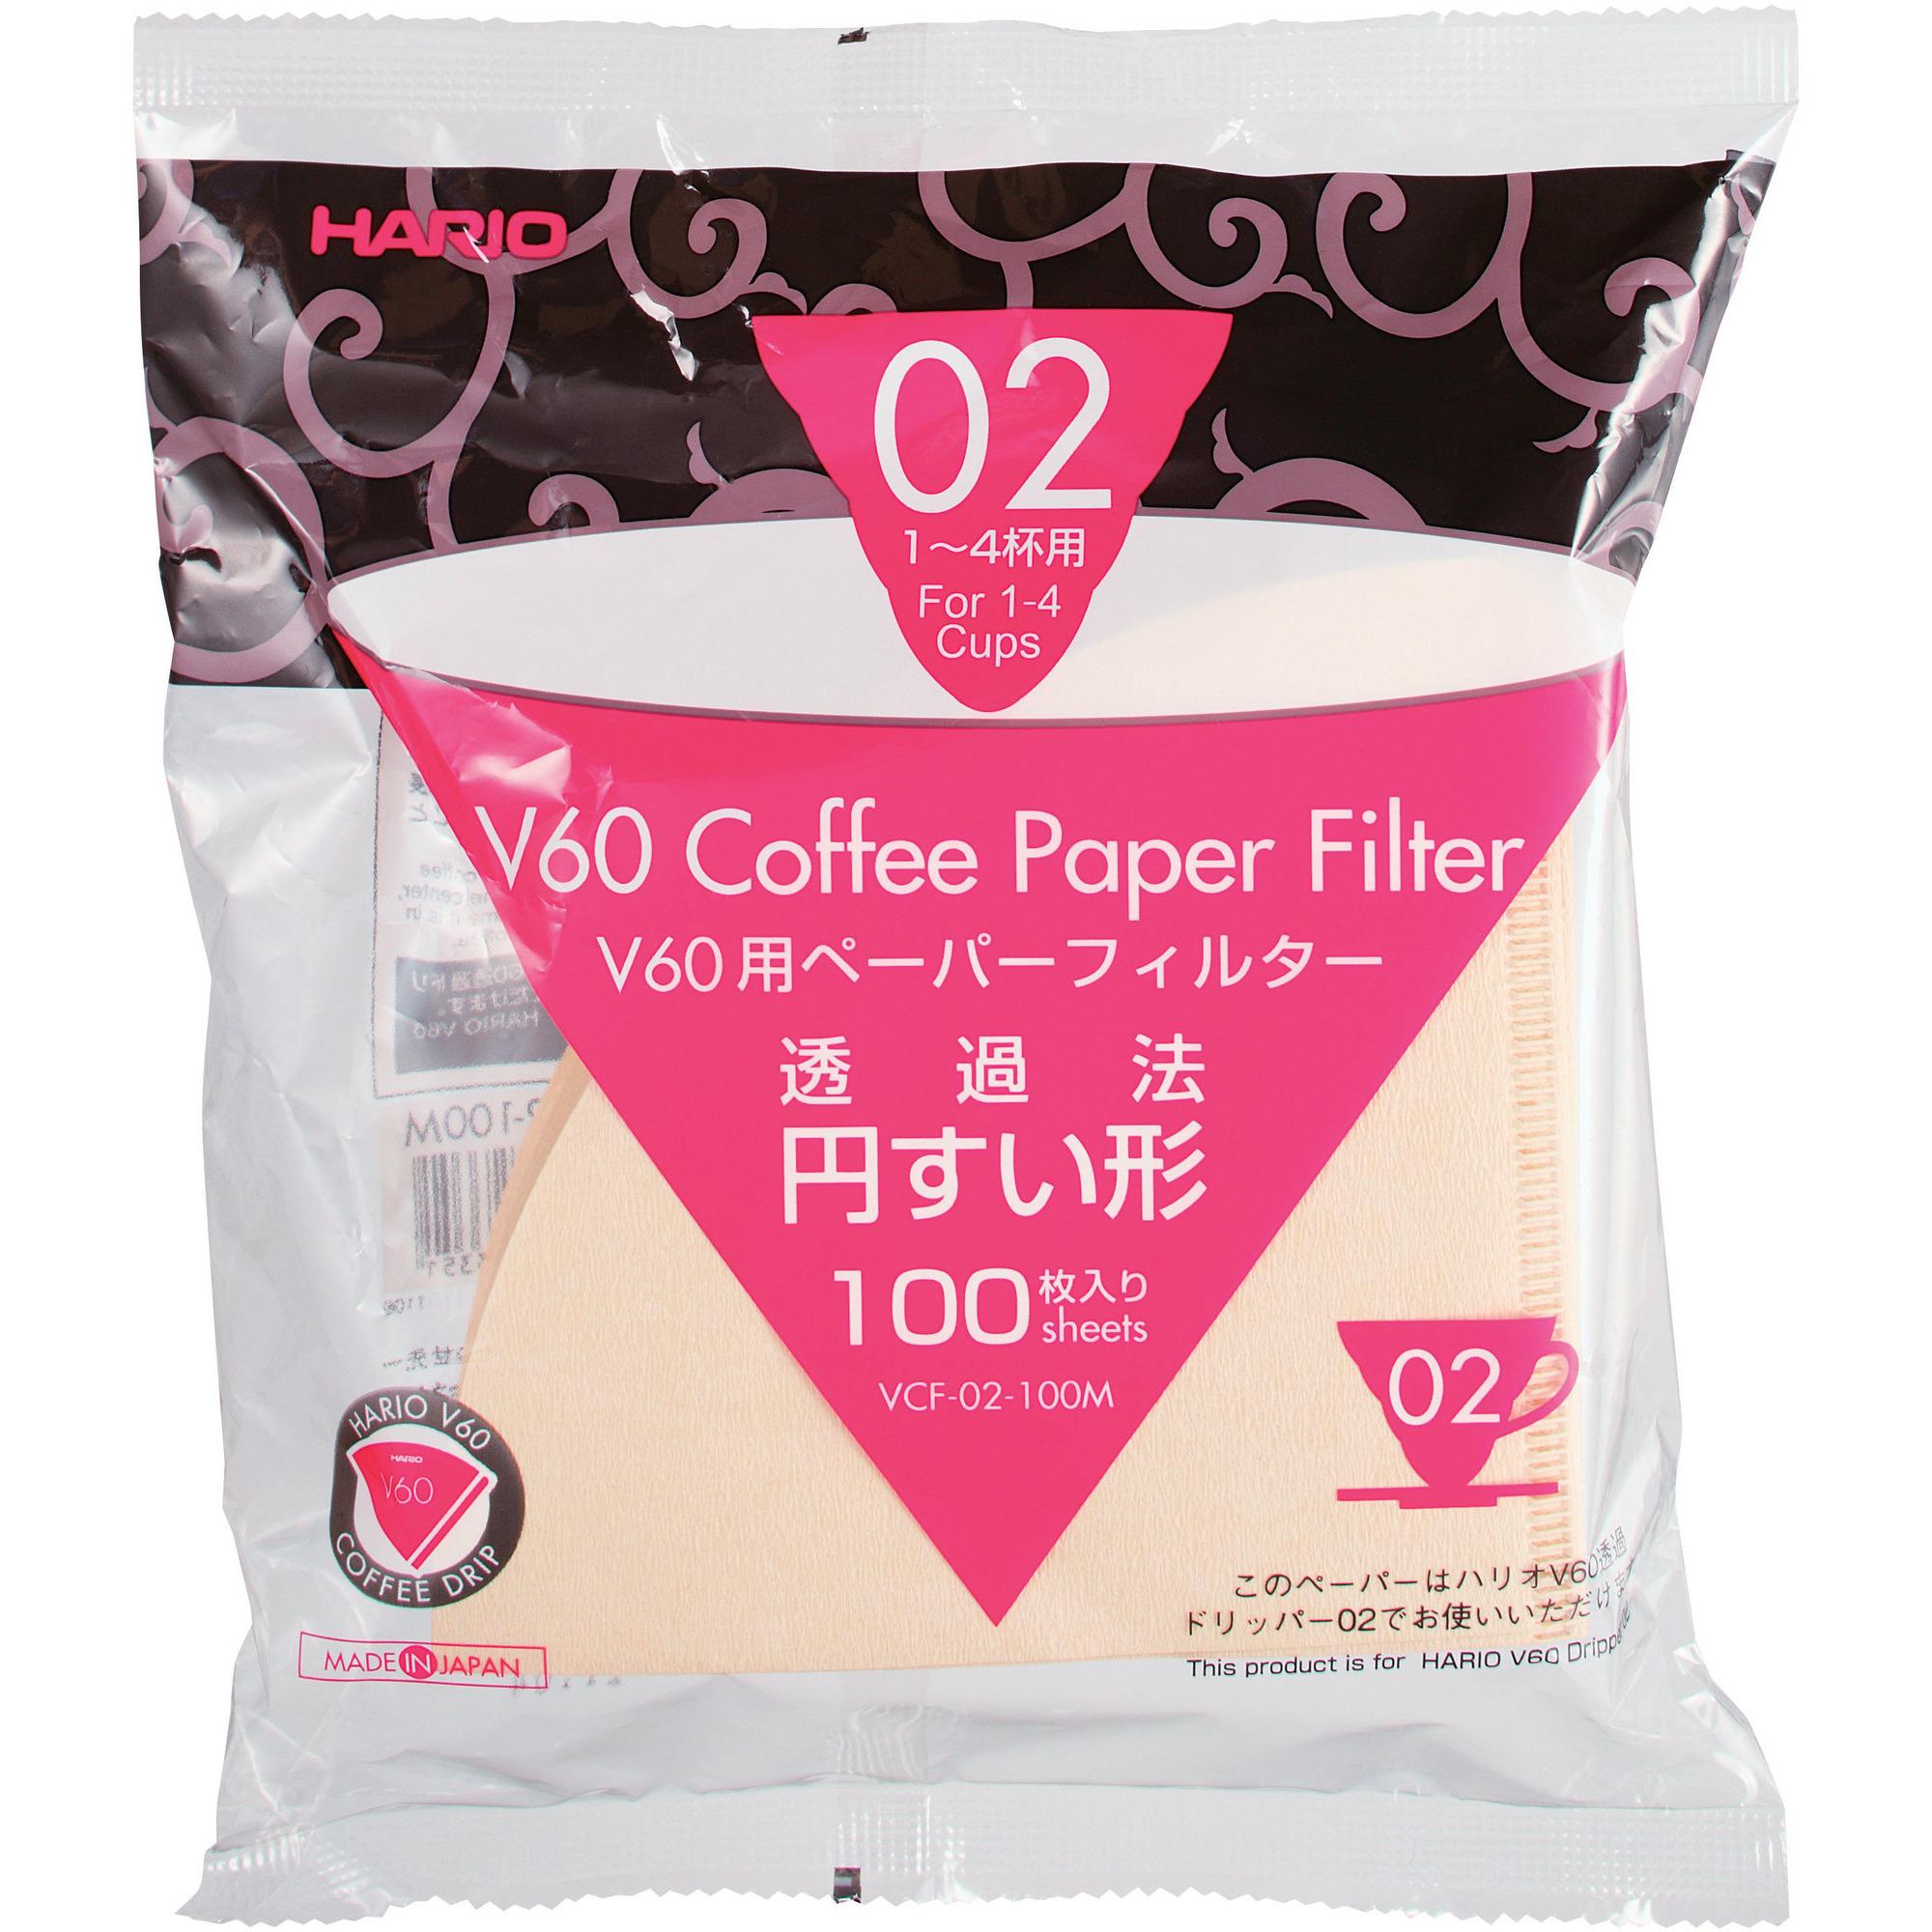 Hario Papir Filter 2 Cup 100 stk.